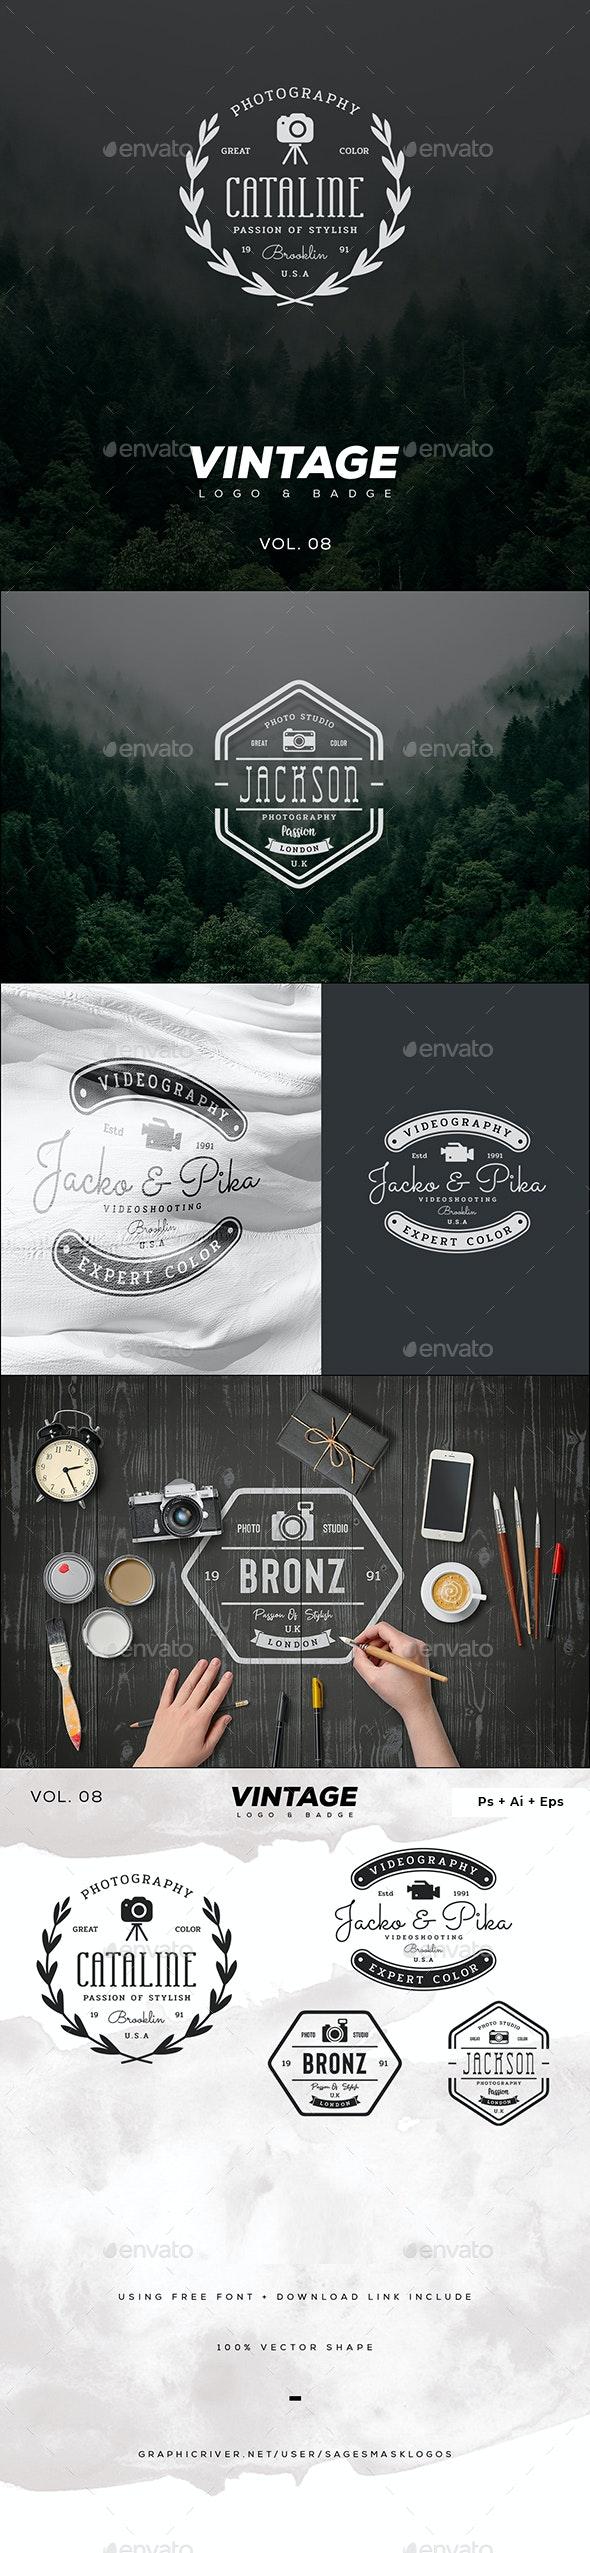 Vintage Logo & Badge Vol. 8 - Badges & Stickers Web Elements